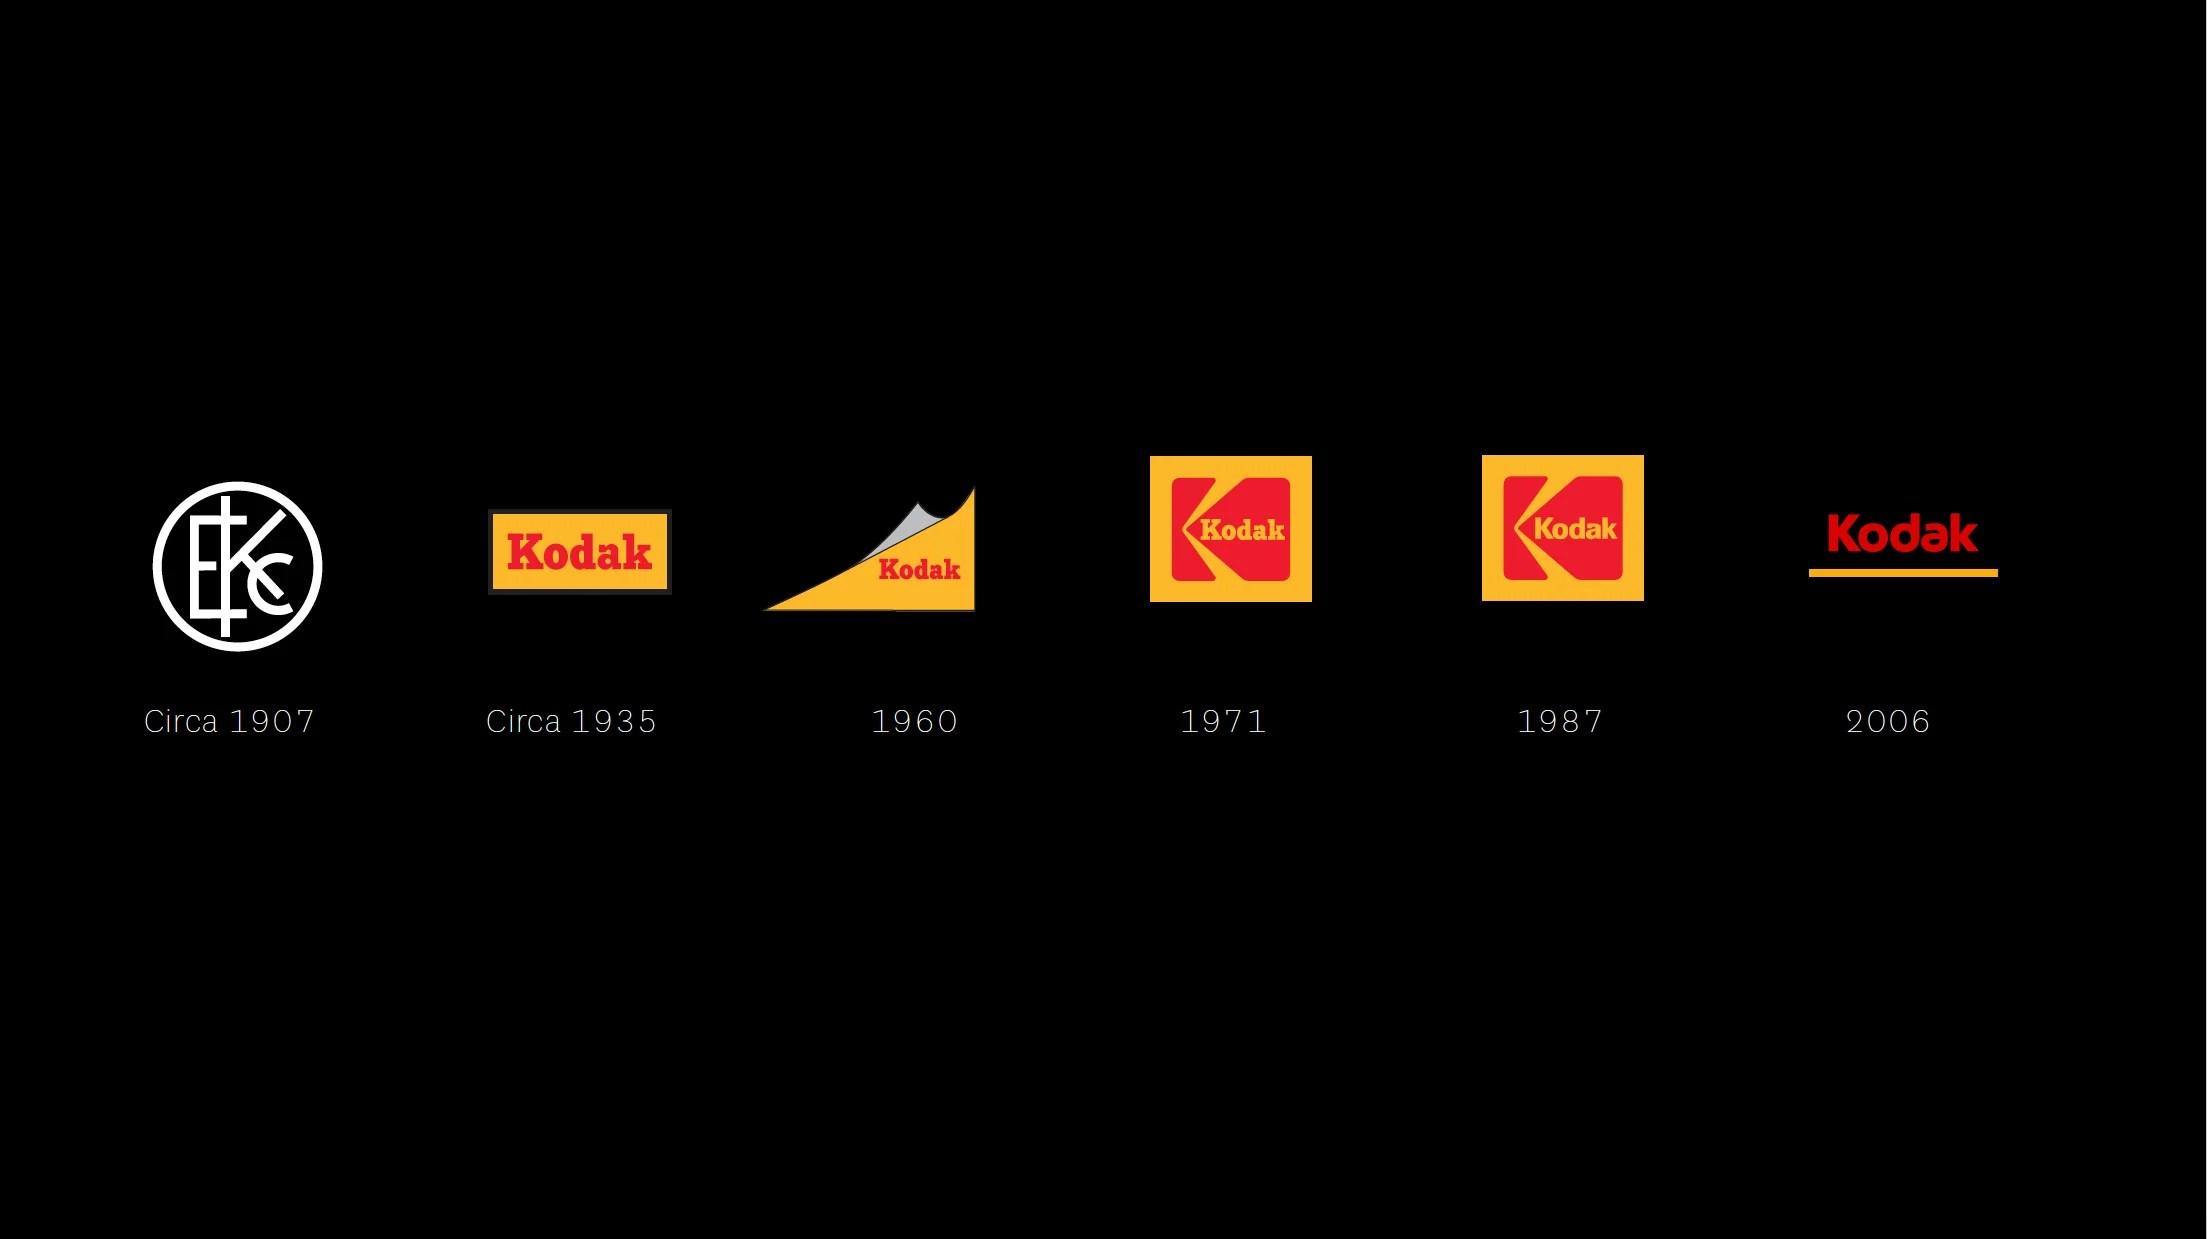 Kodak Logos from 1907 to 2006